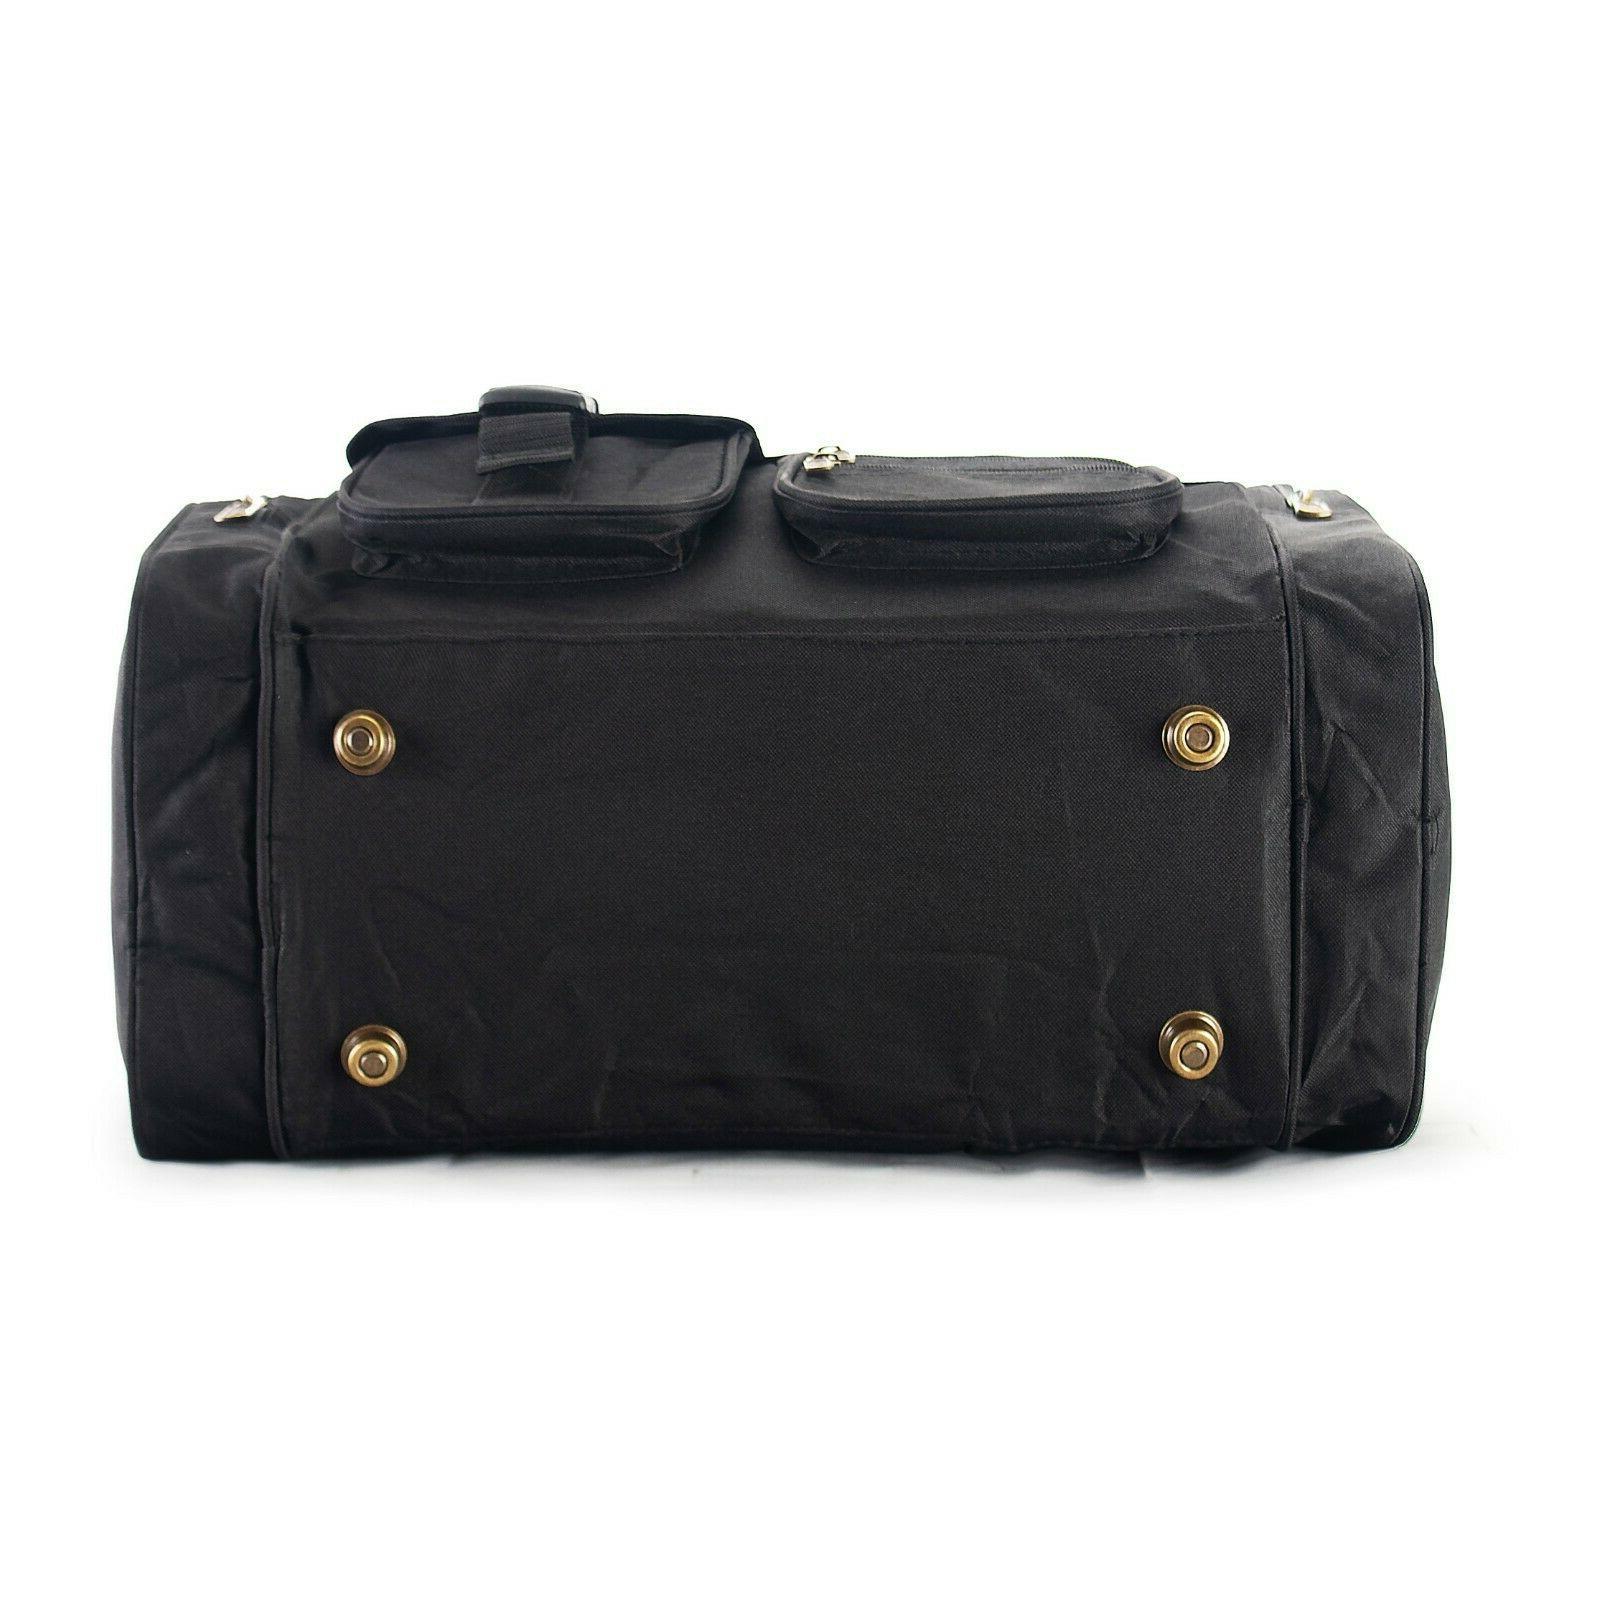 "19"" Inch Black Carry on Suitcase Lightweight Shoulder"